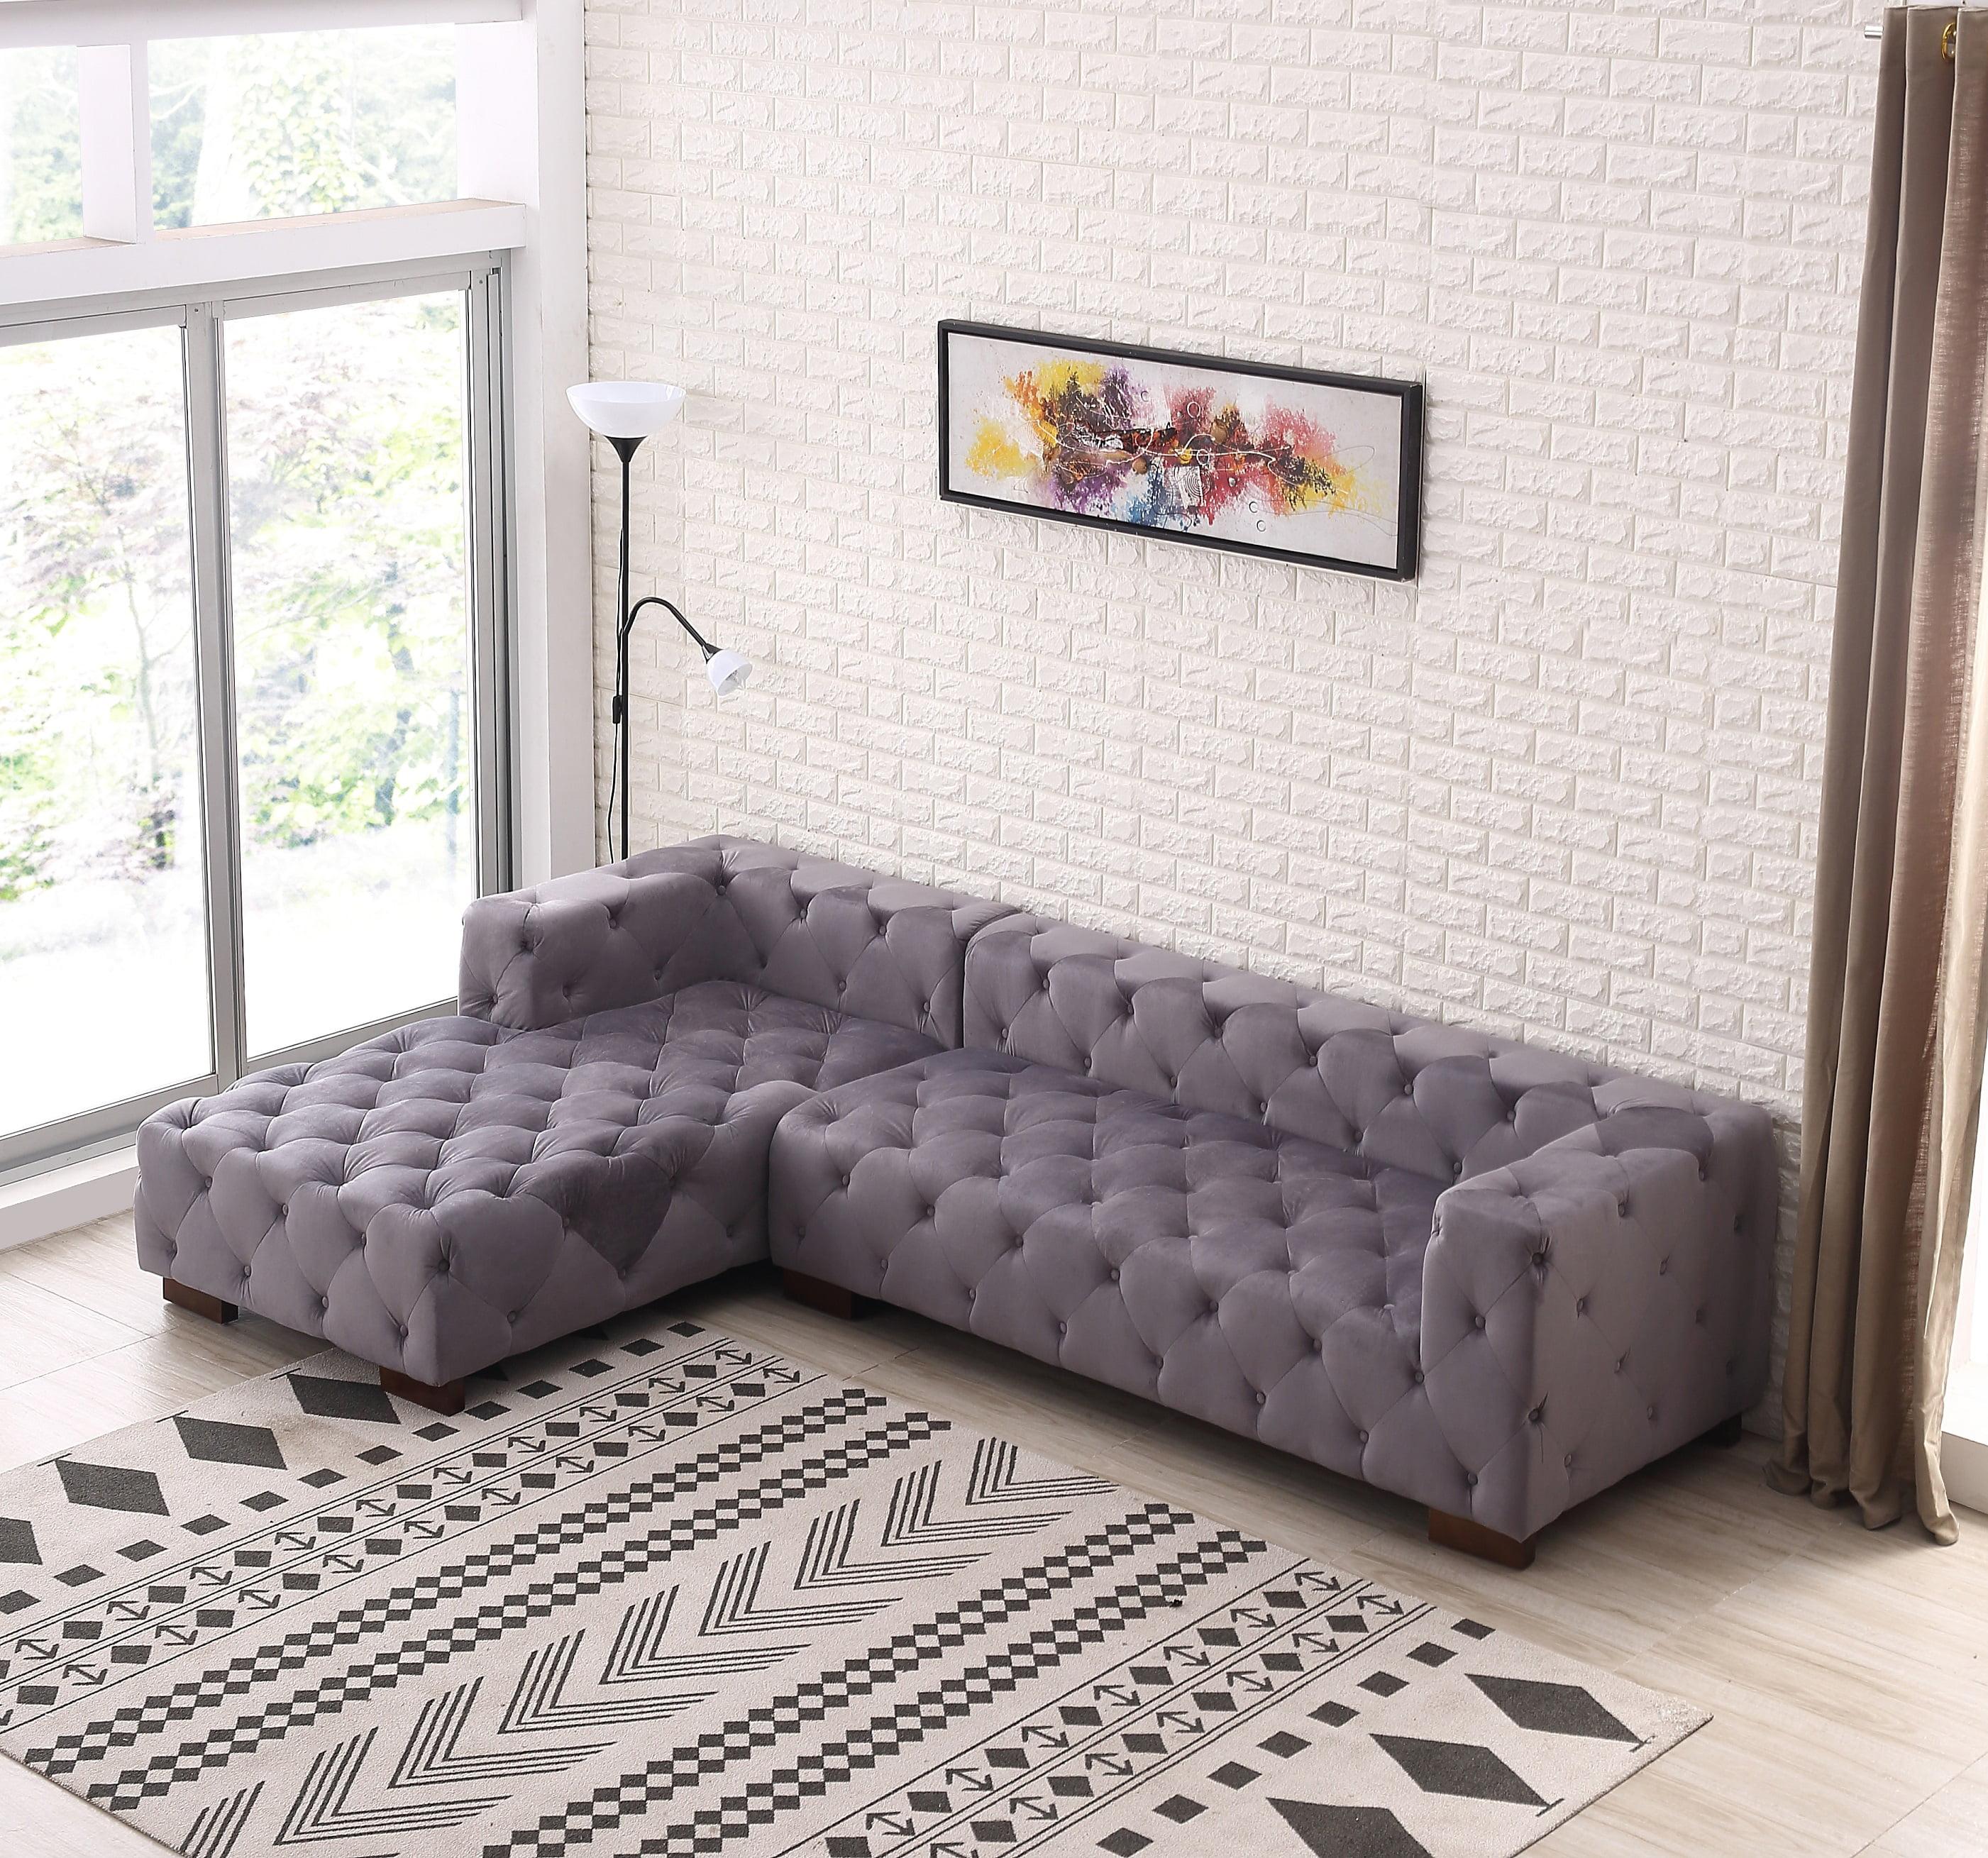 Us Pride Furniture Tufted Chesterfield Sectional Sofa Left Facing Walmart Com Walmart Com